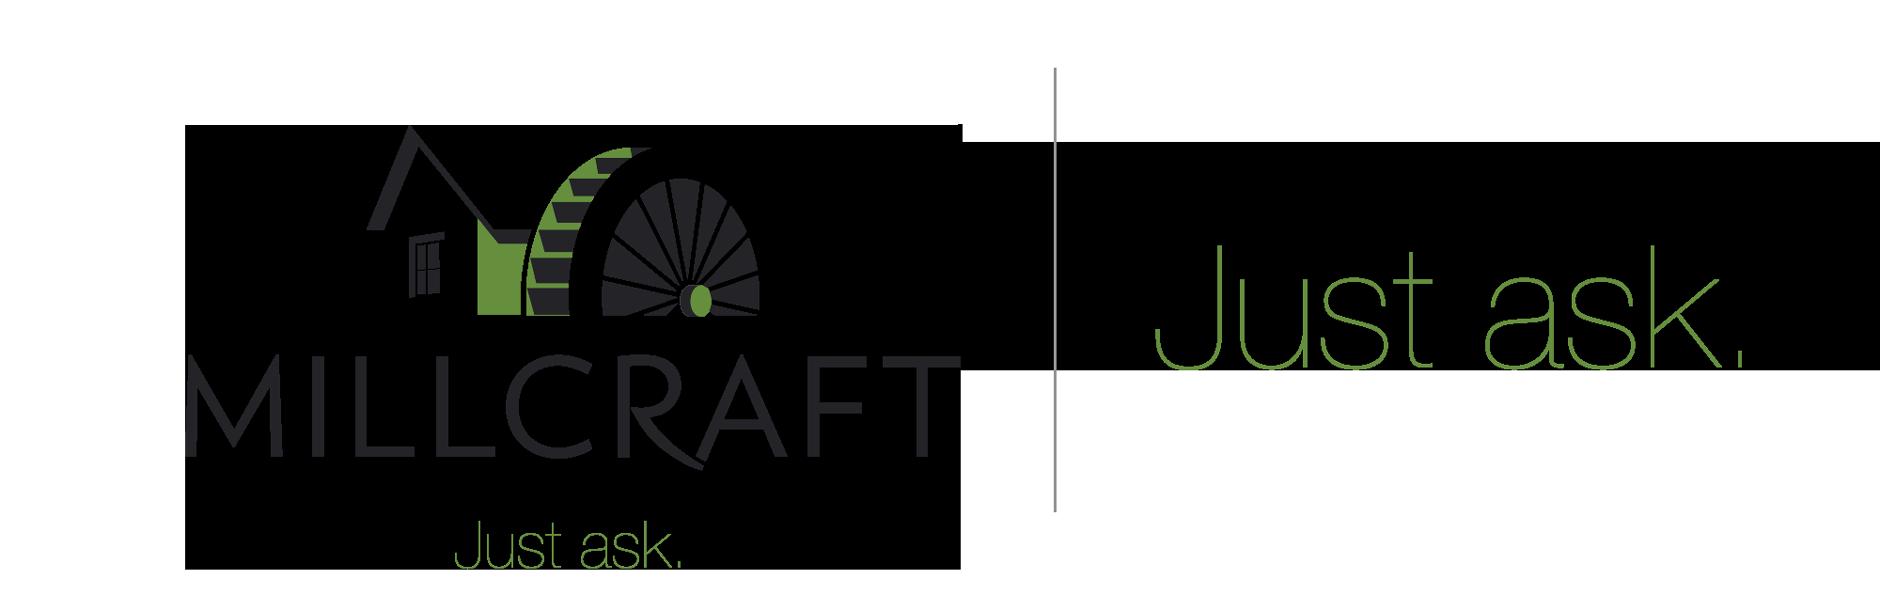 Millcraft Logo-and-Tagline | Company Rebranding